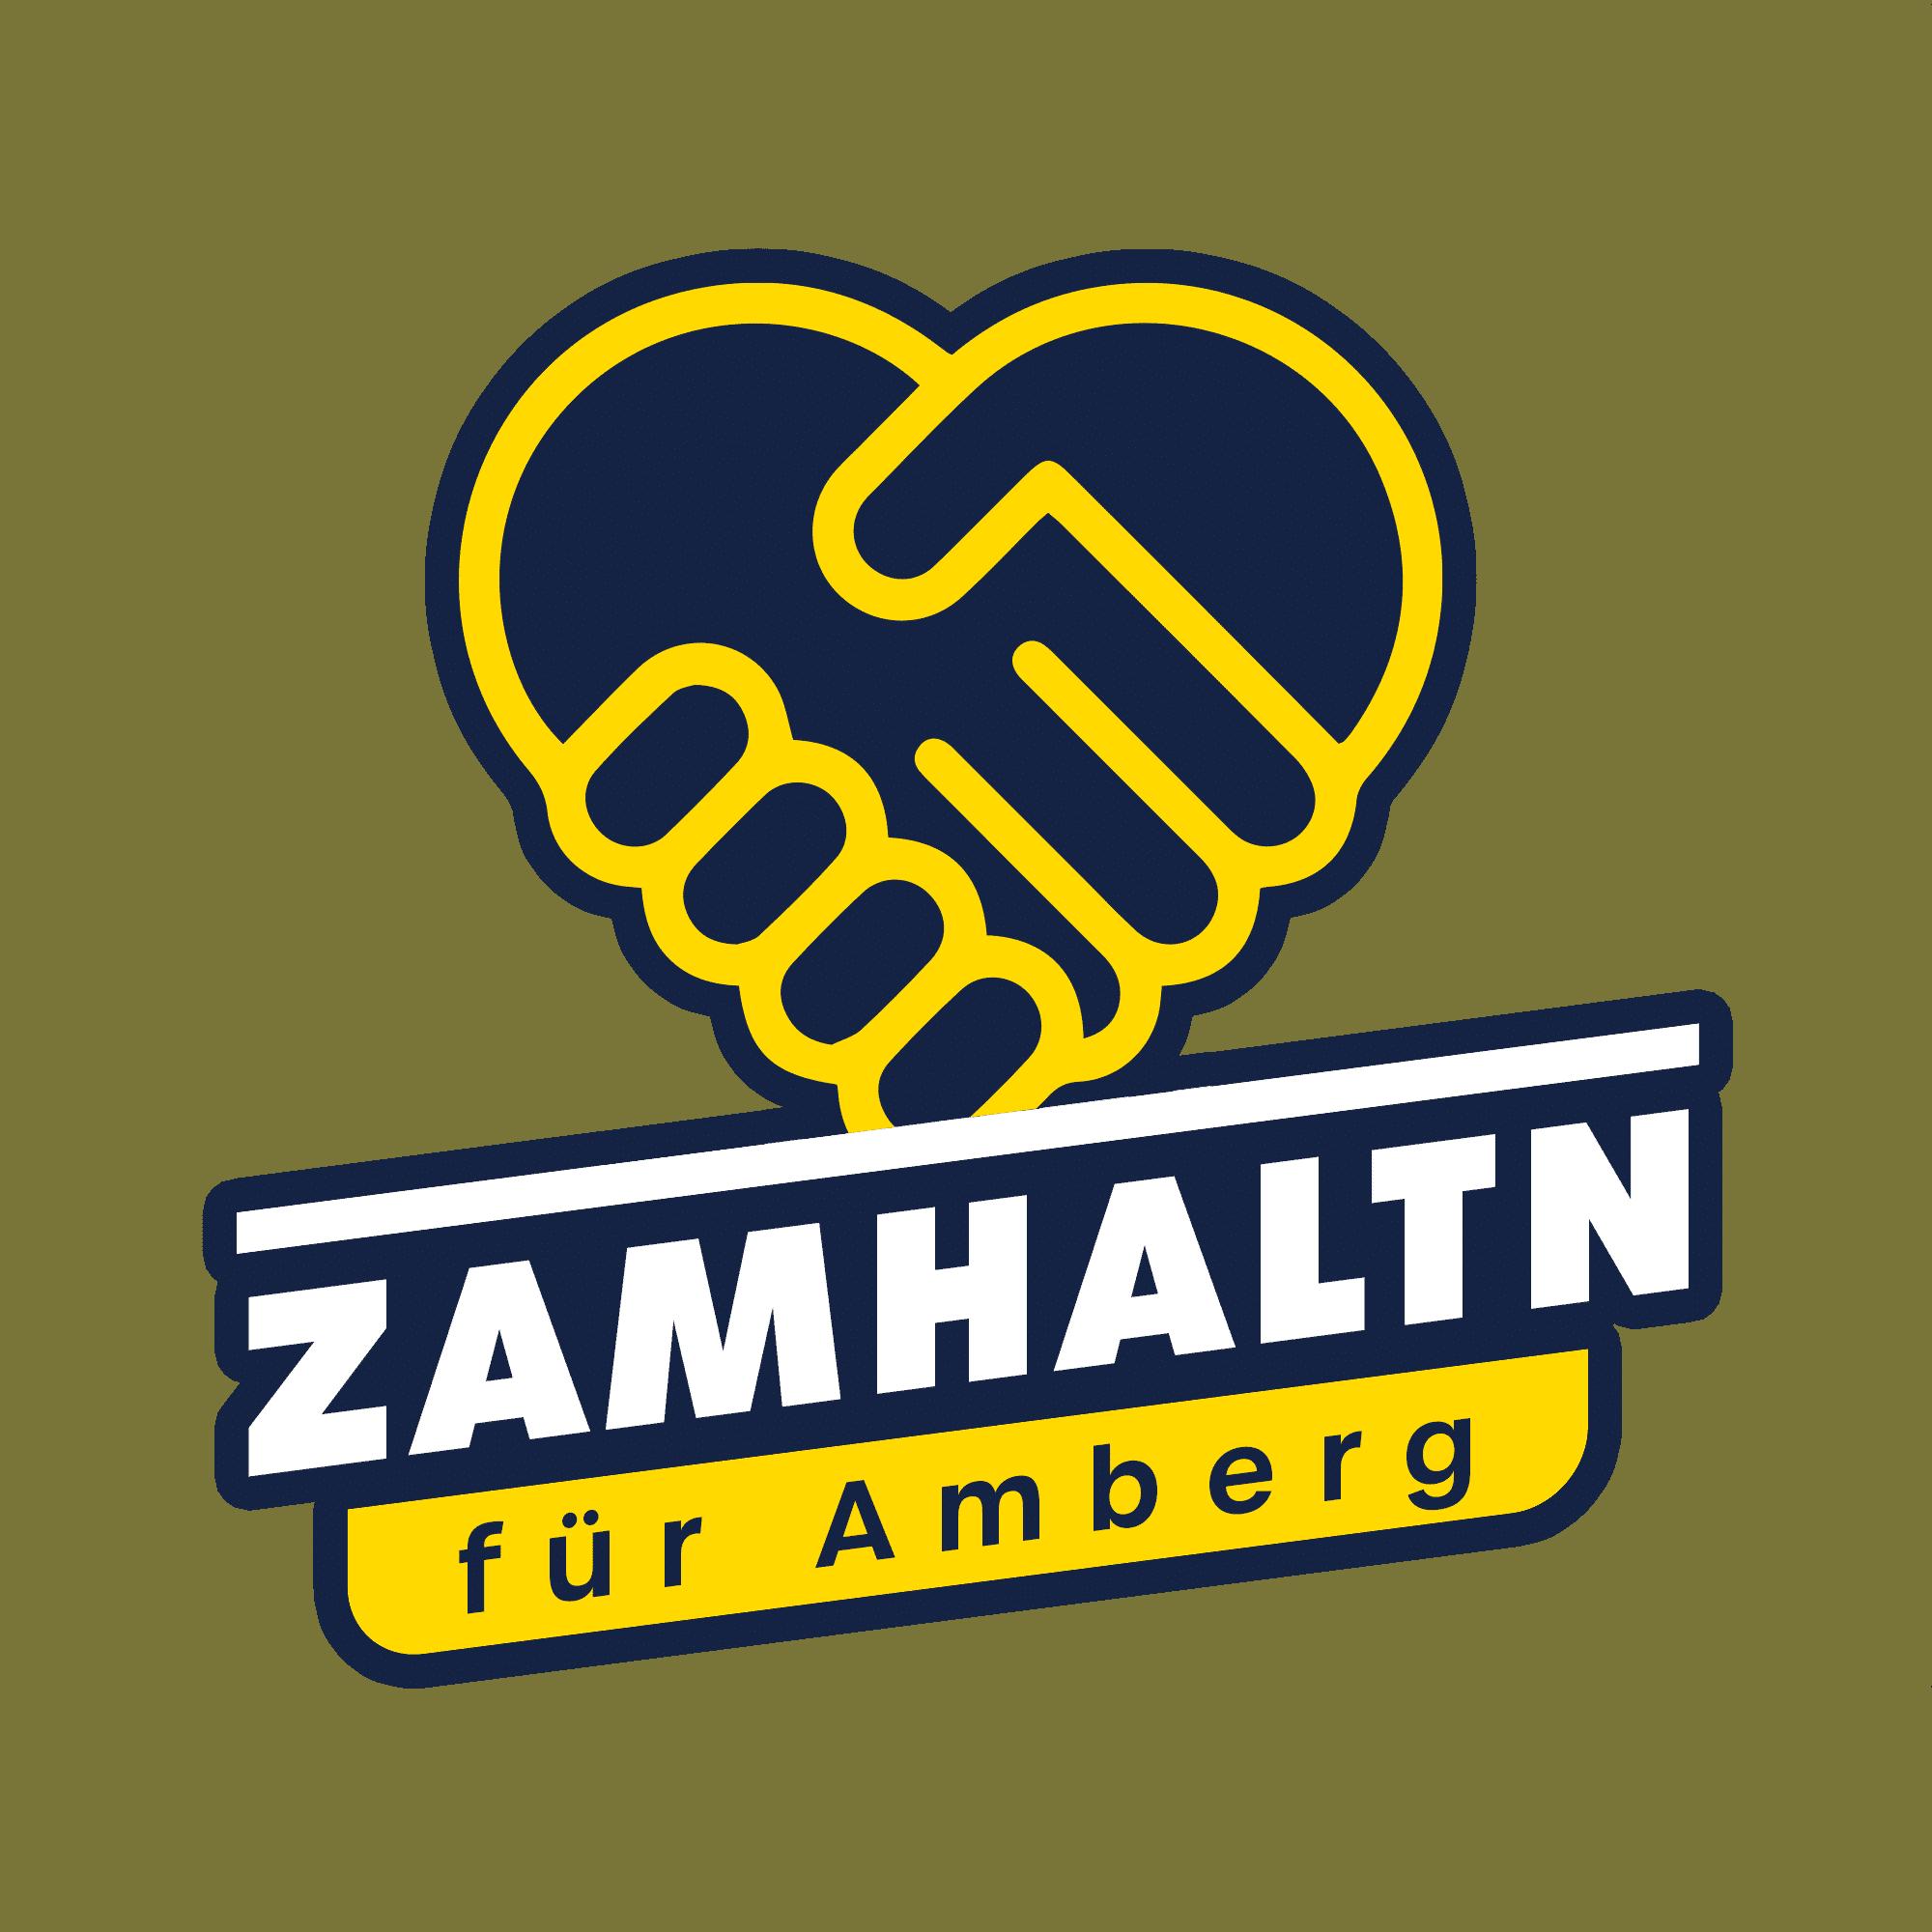 ZAMHALTN_HERZ_FREI